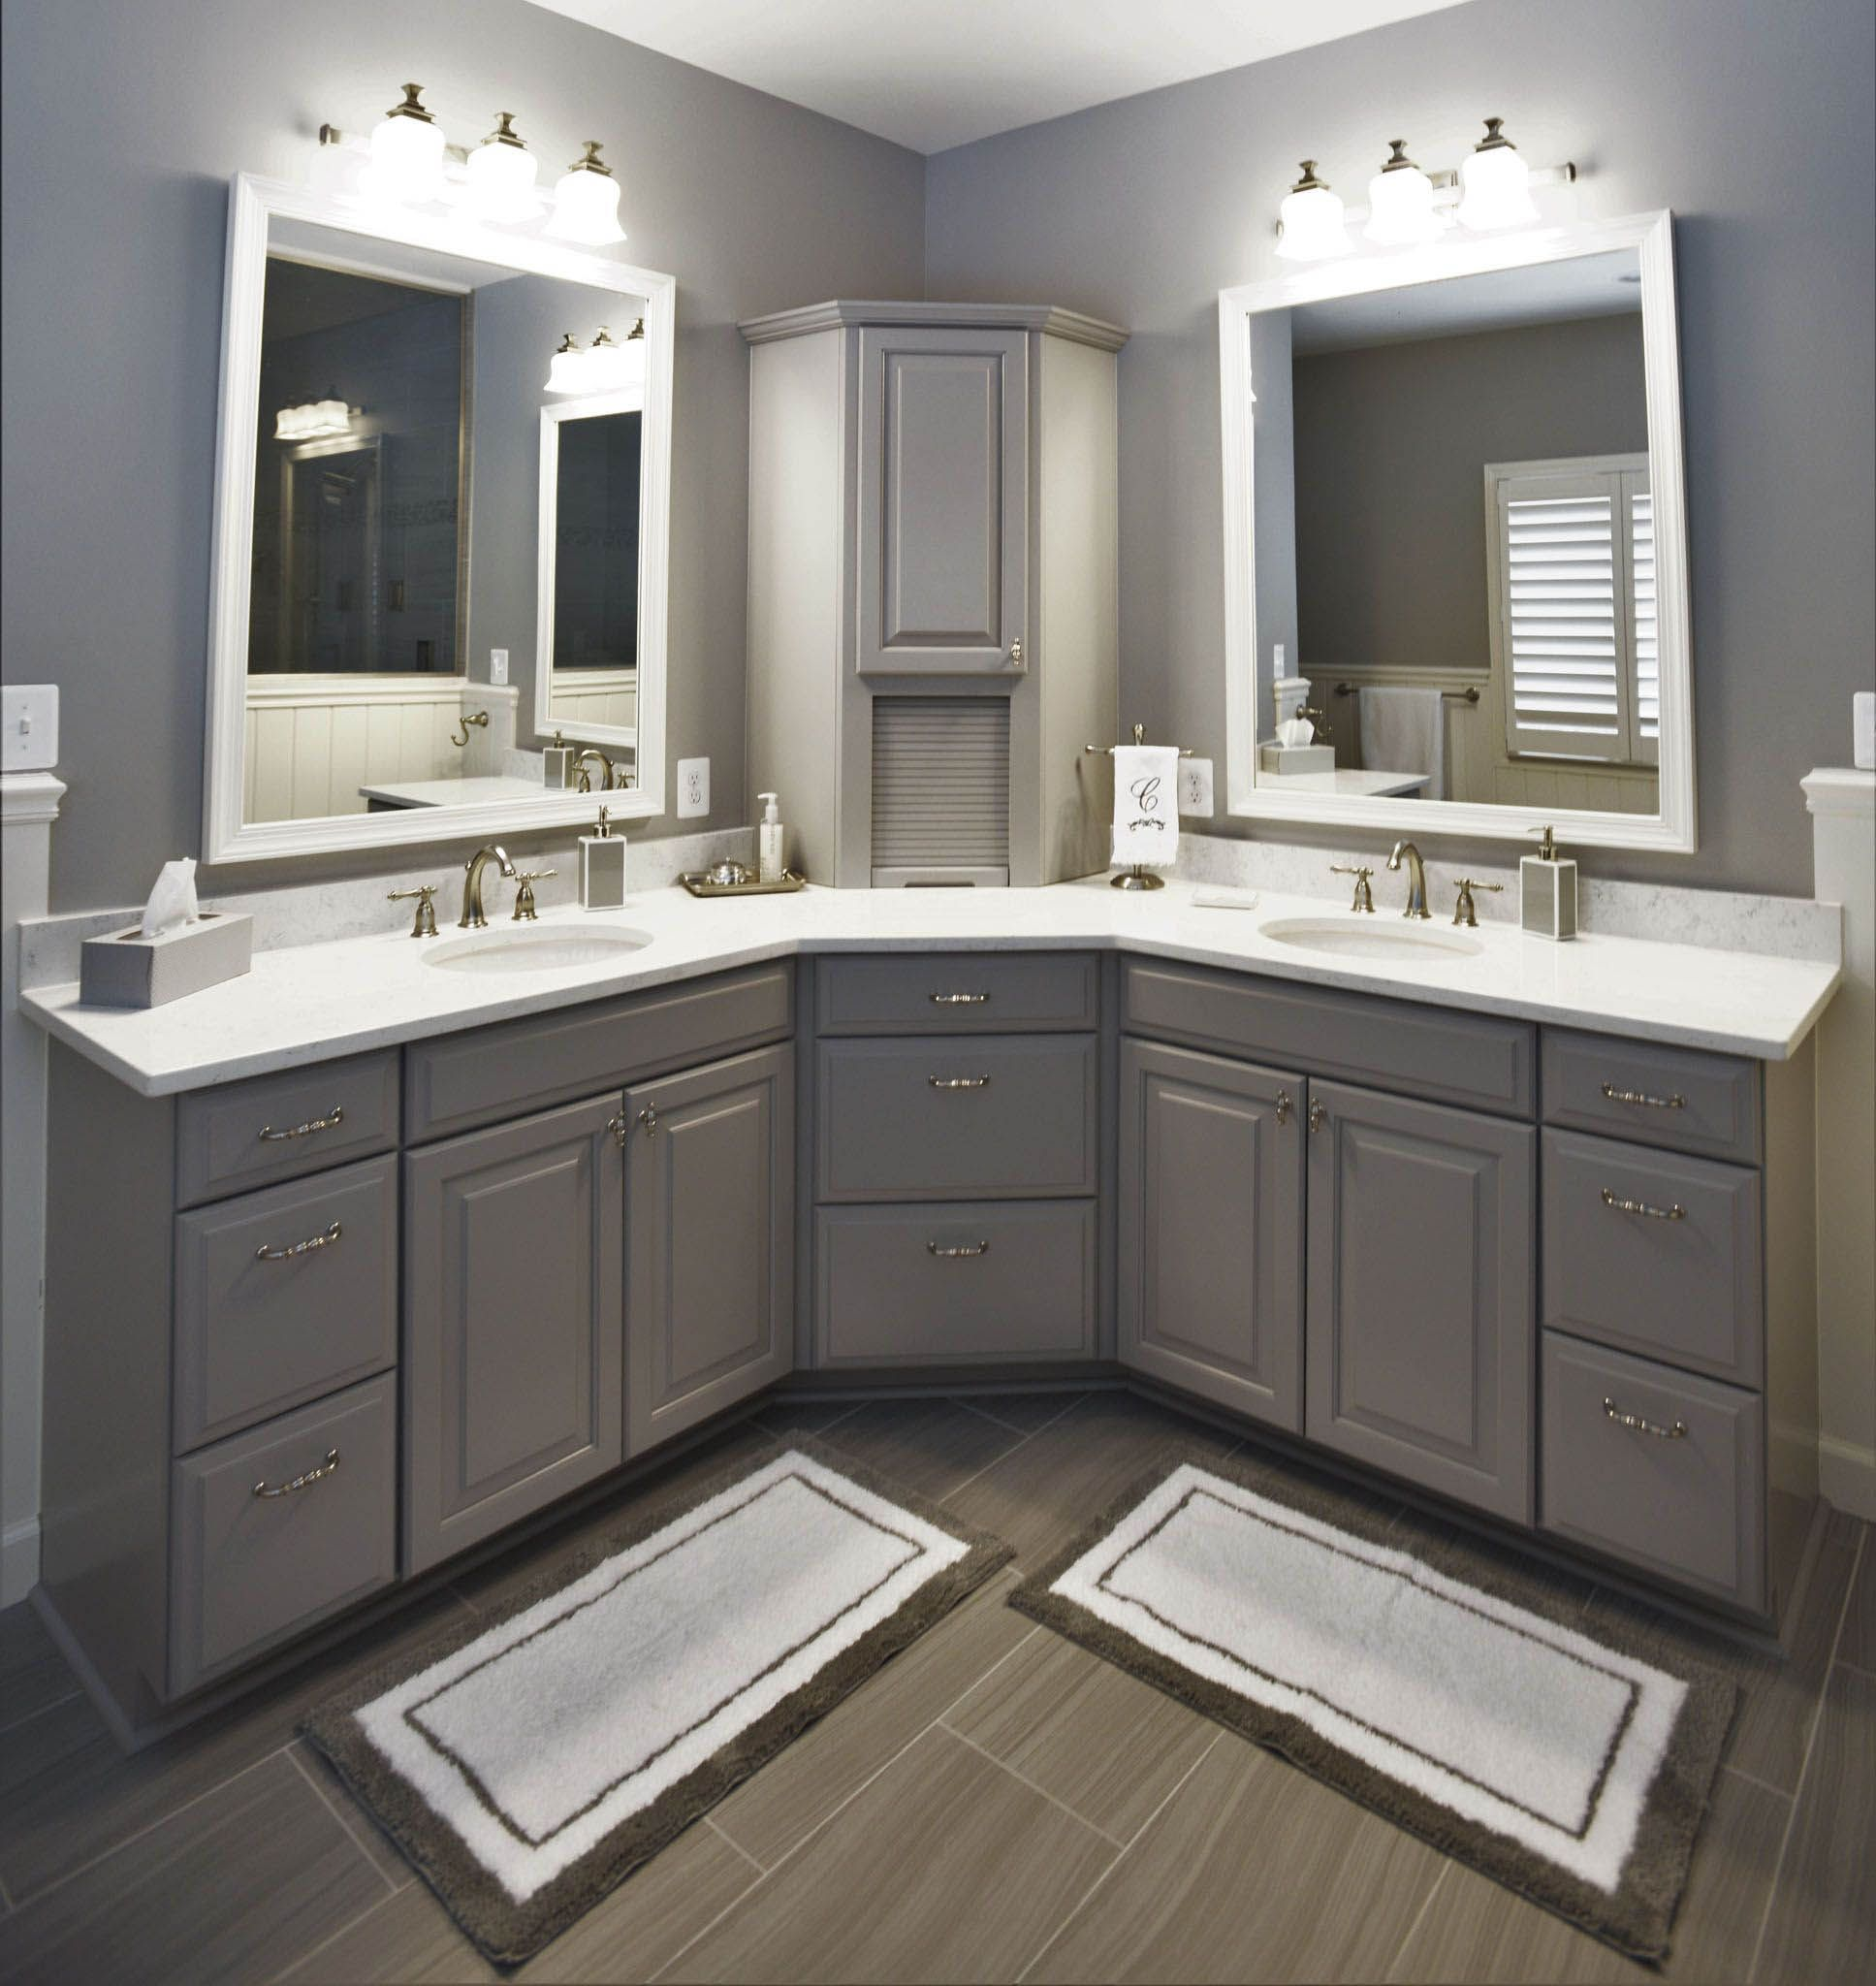 Edge Shower Room Vanit Corner Bathroom Vanity Bathroom Countertops Bathroom Remodel Master